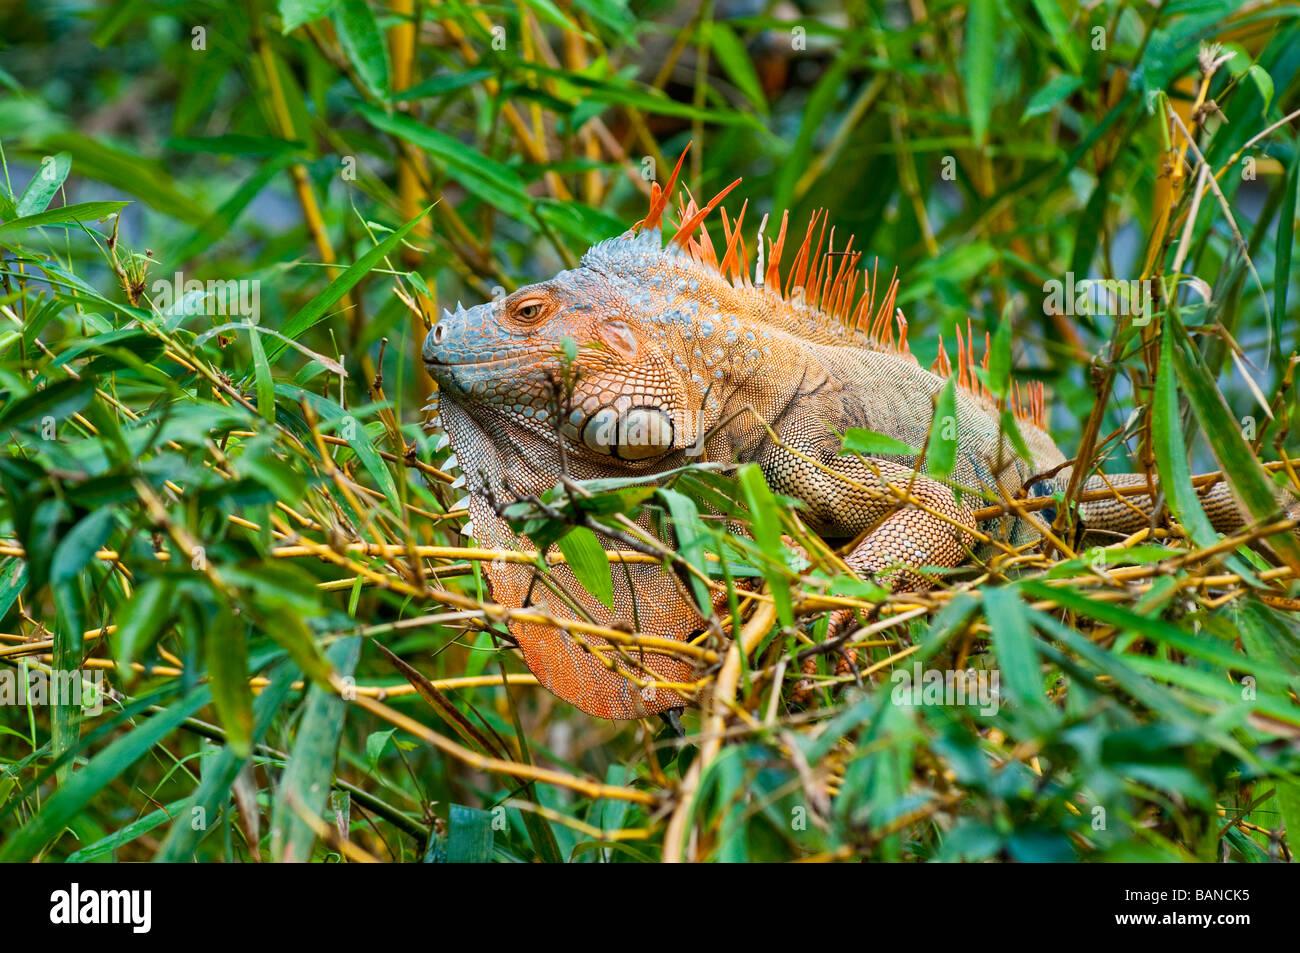 A green iguana in breeding color in a tree in Costa Rica, Central ...